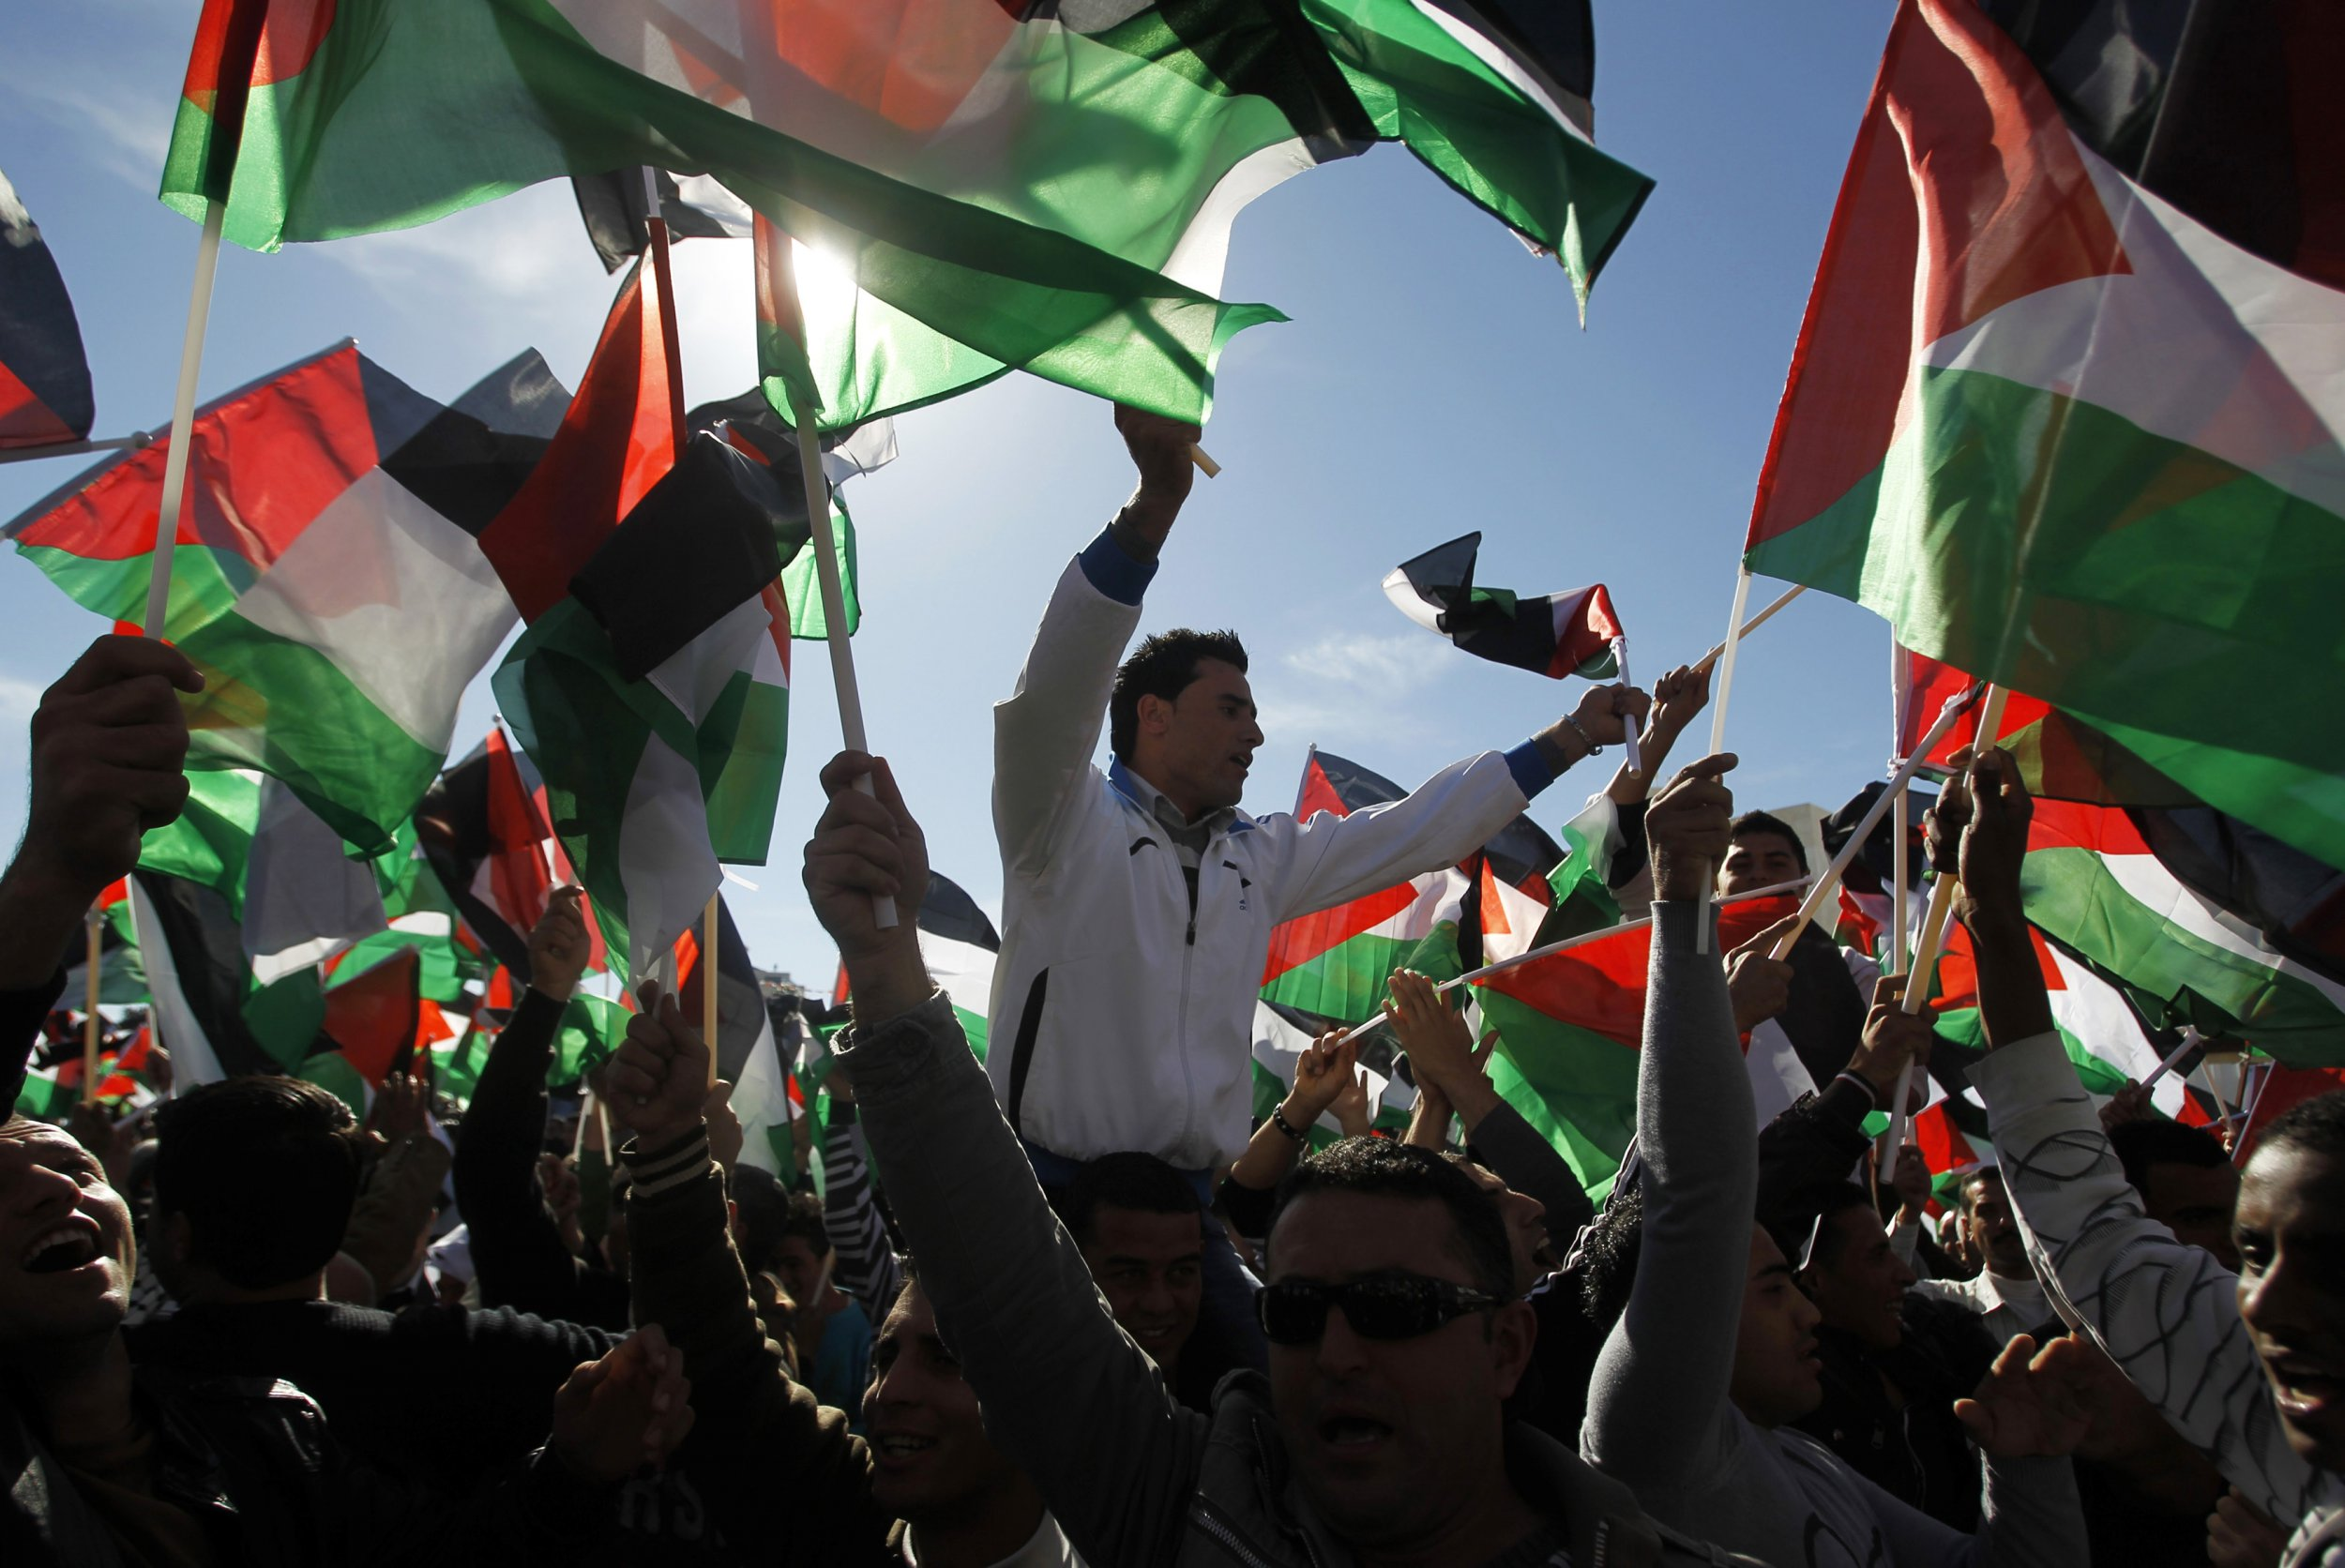 09_09 Palestine Flag General Assembly